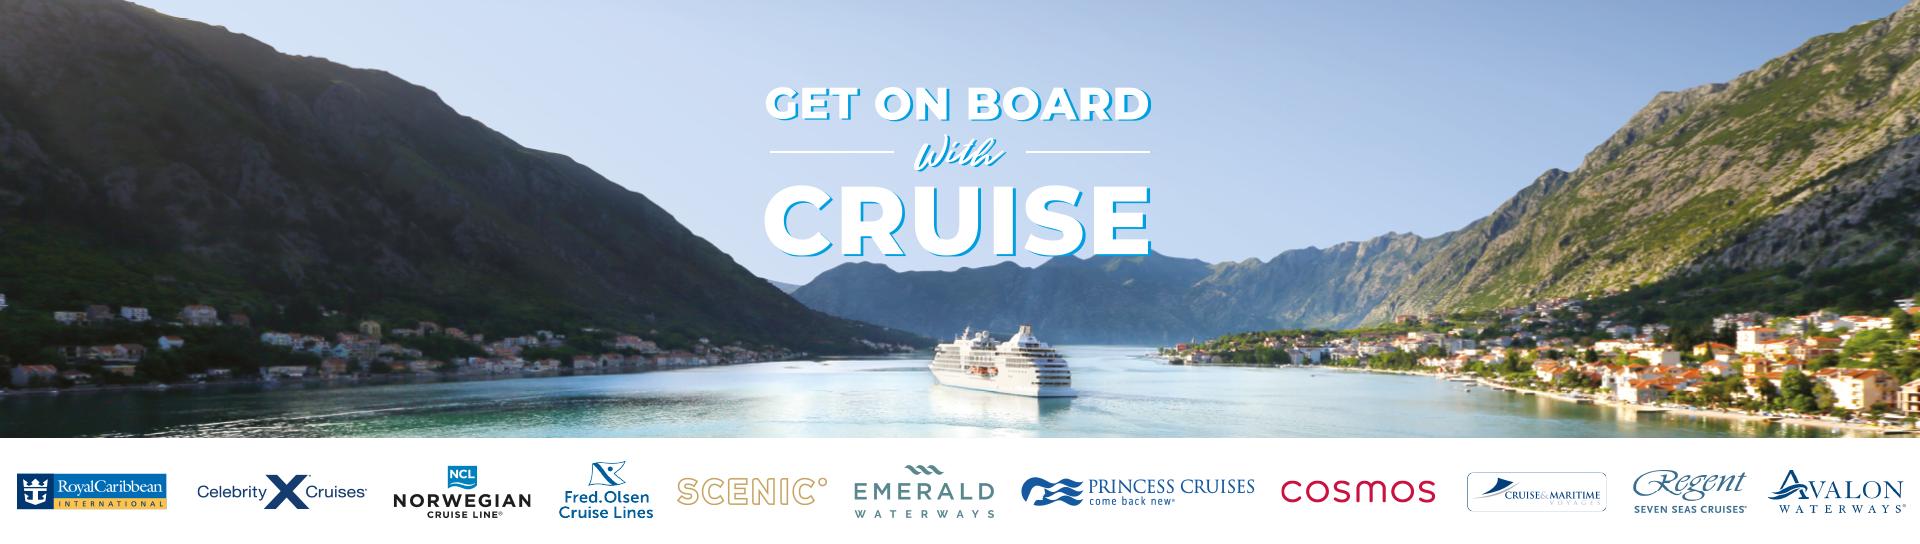 Cruise Web Banner